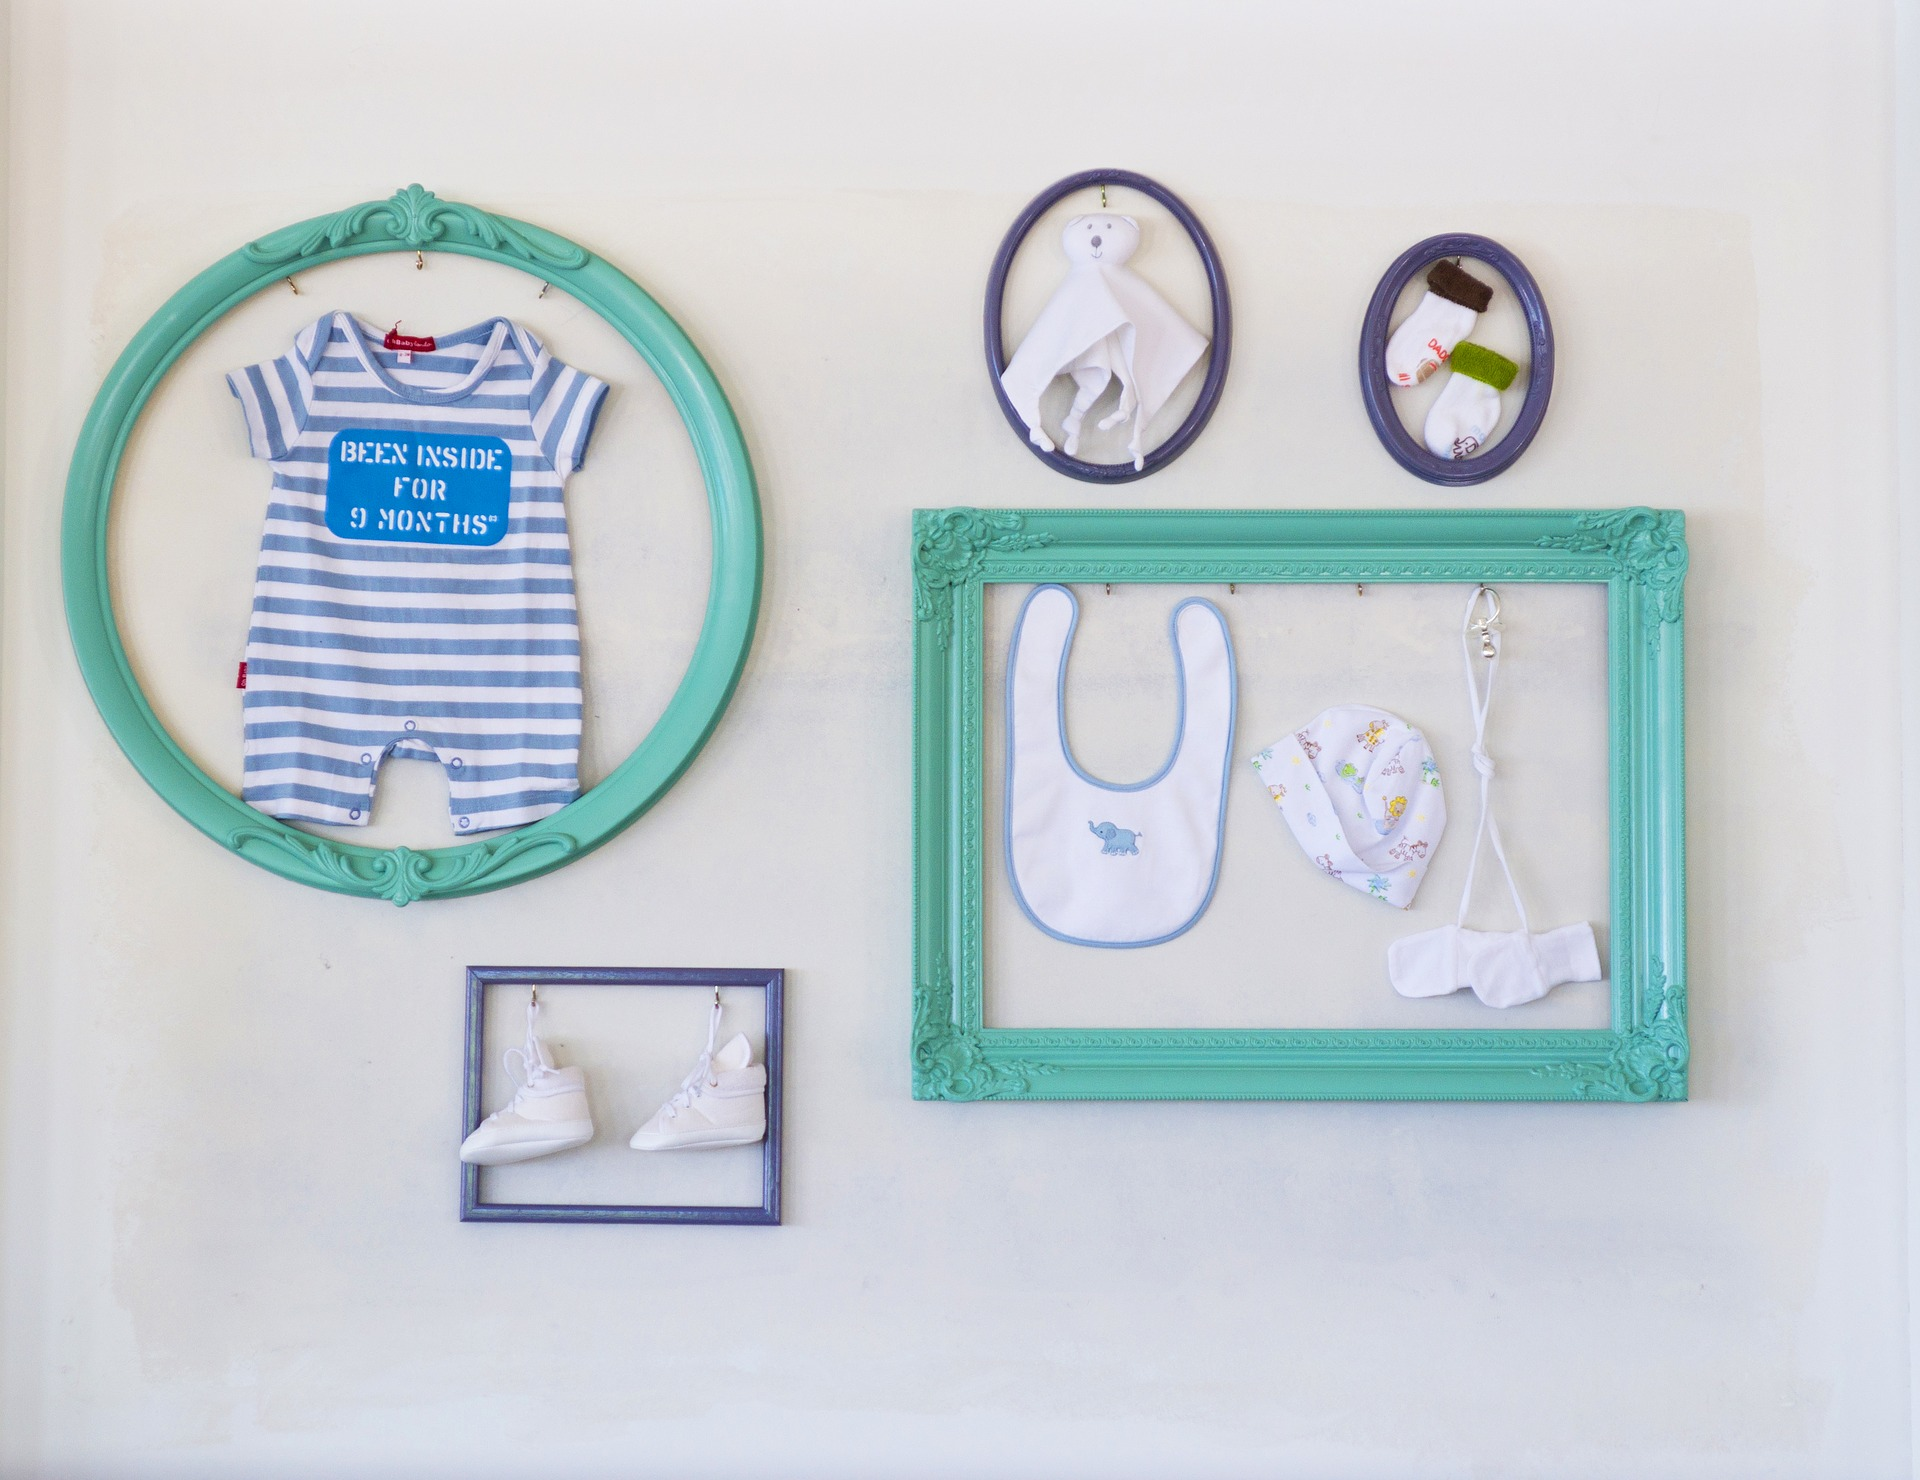 Regalos Útiles - mamas360 - Baby Shower